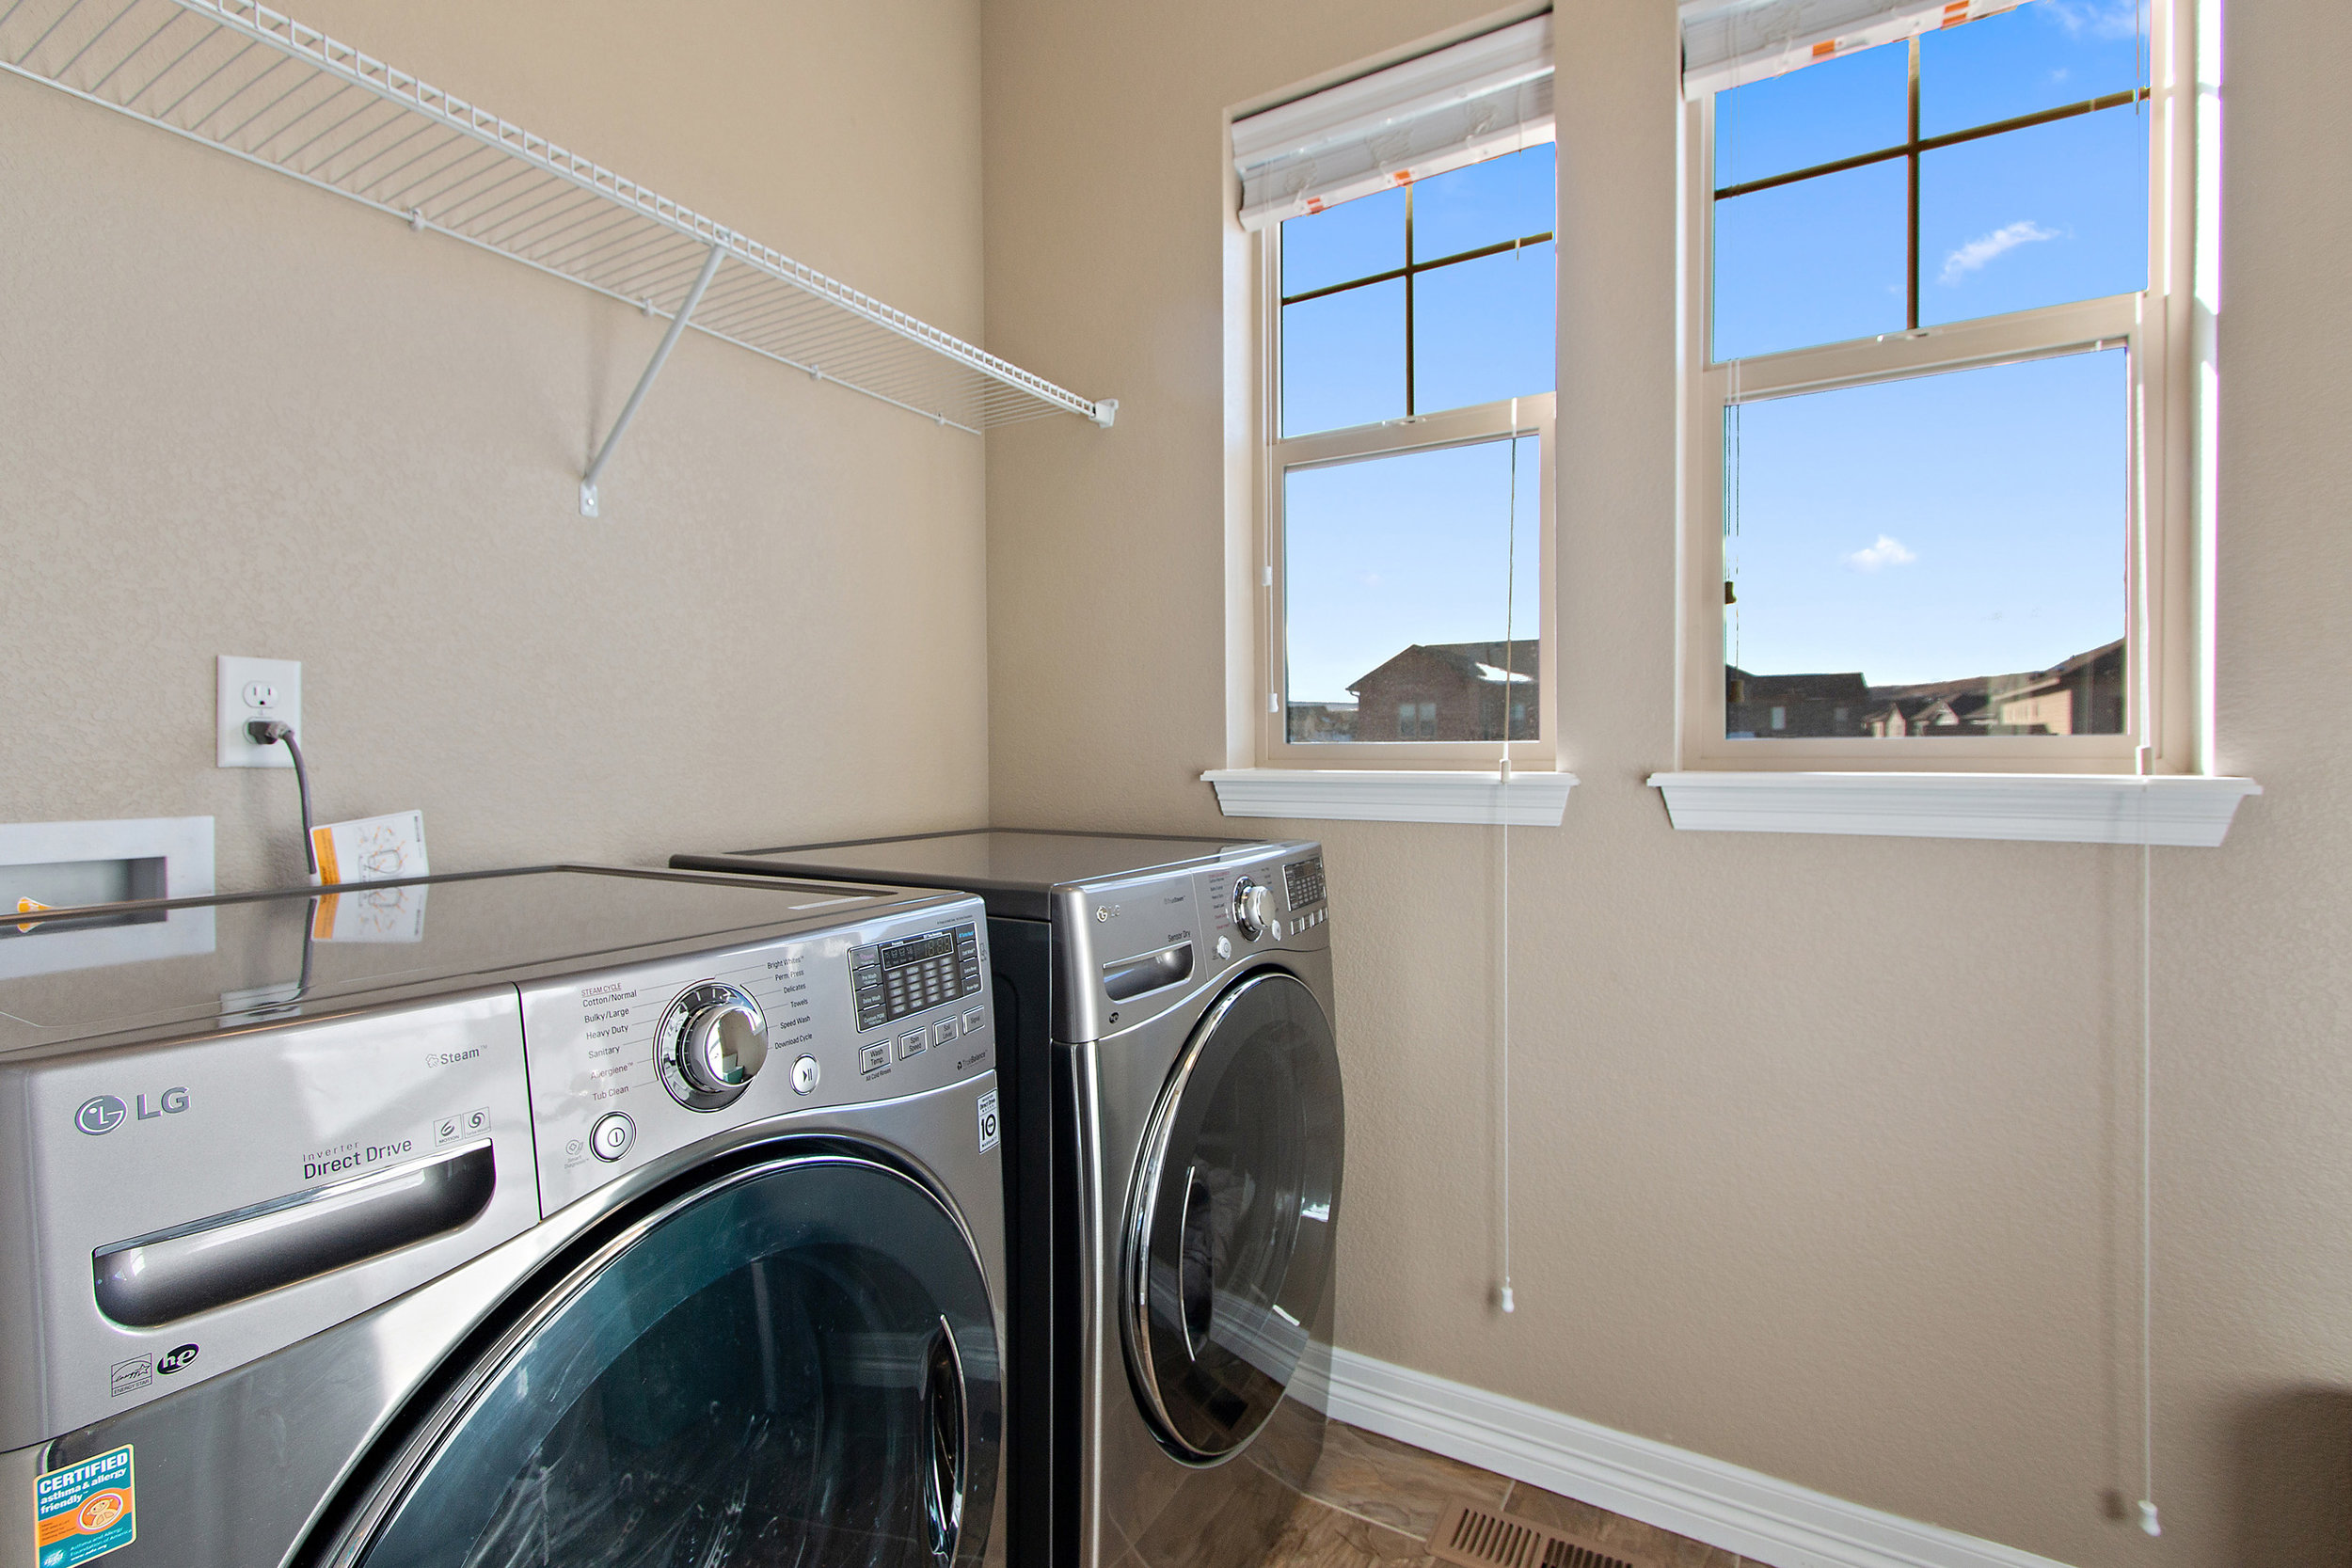 26 Laundry.jpg